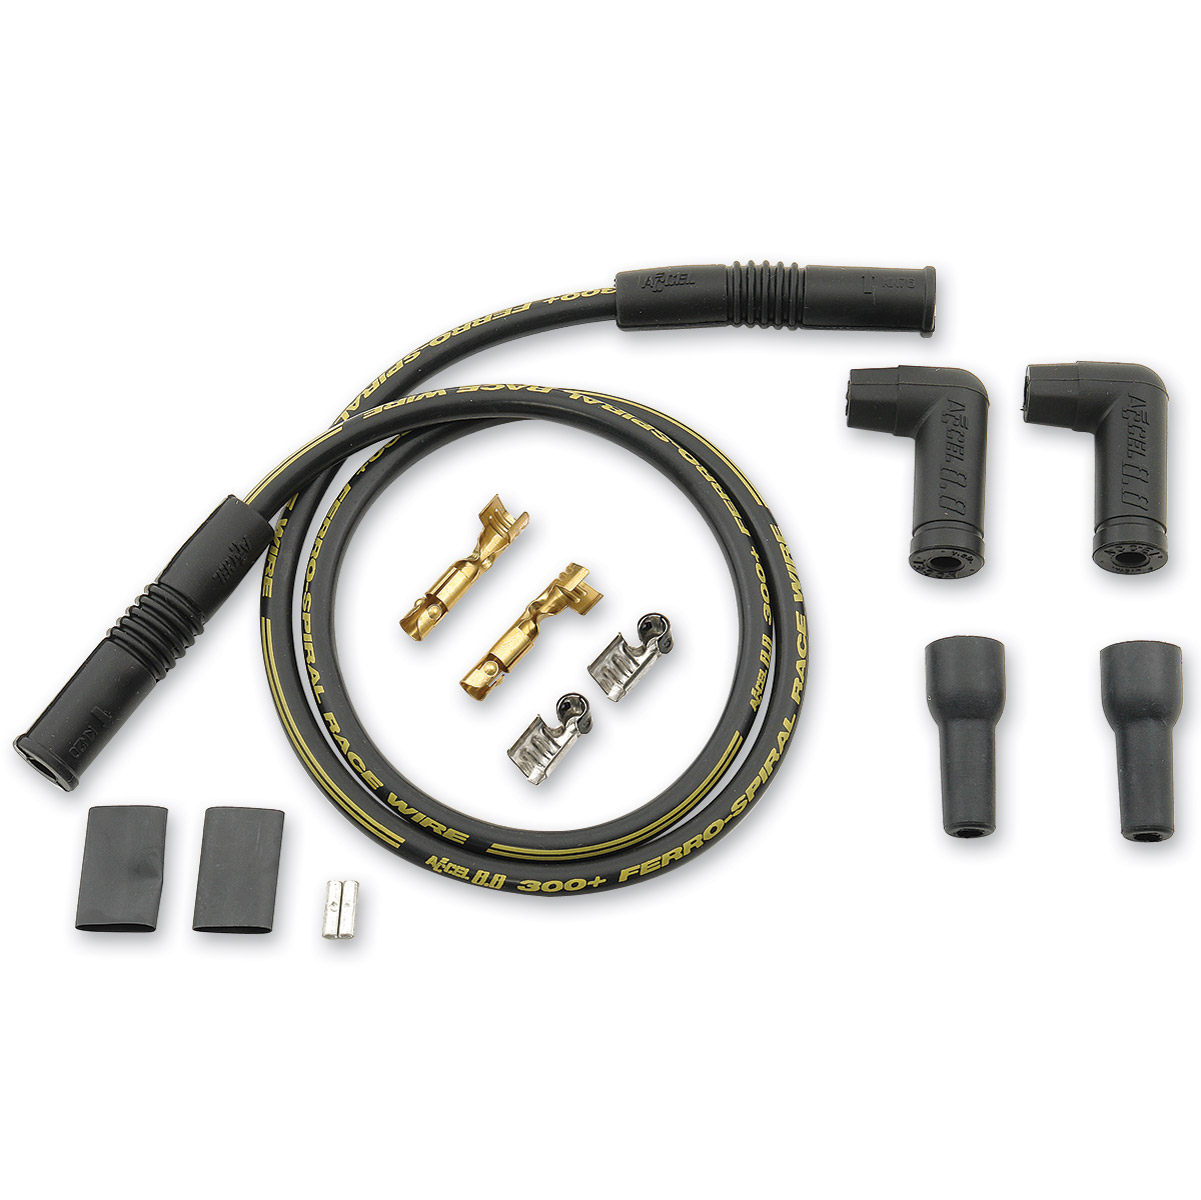 ACCEL '300+' Spark Plug Wire Set - 175095